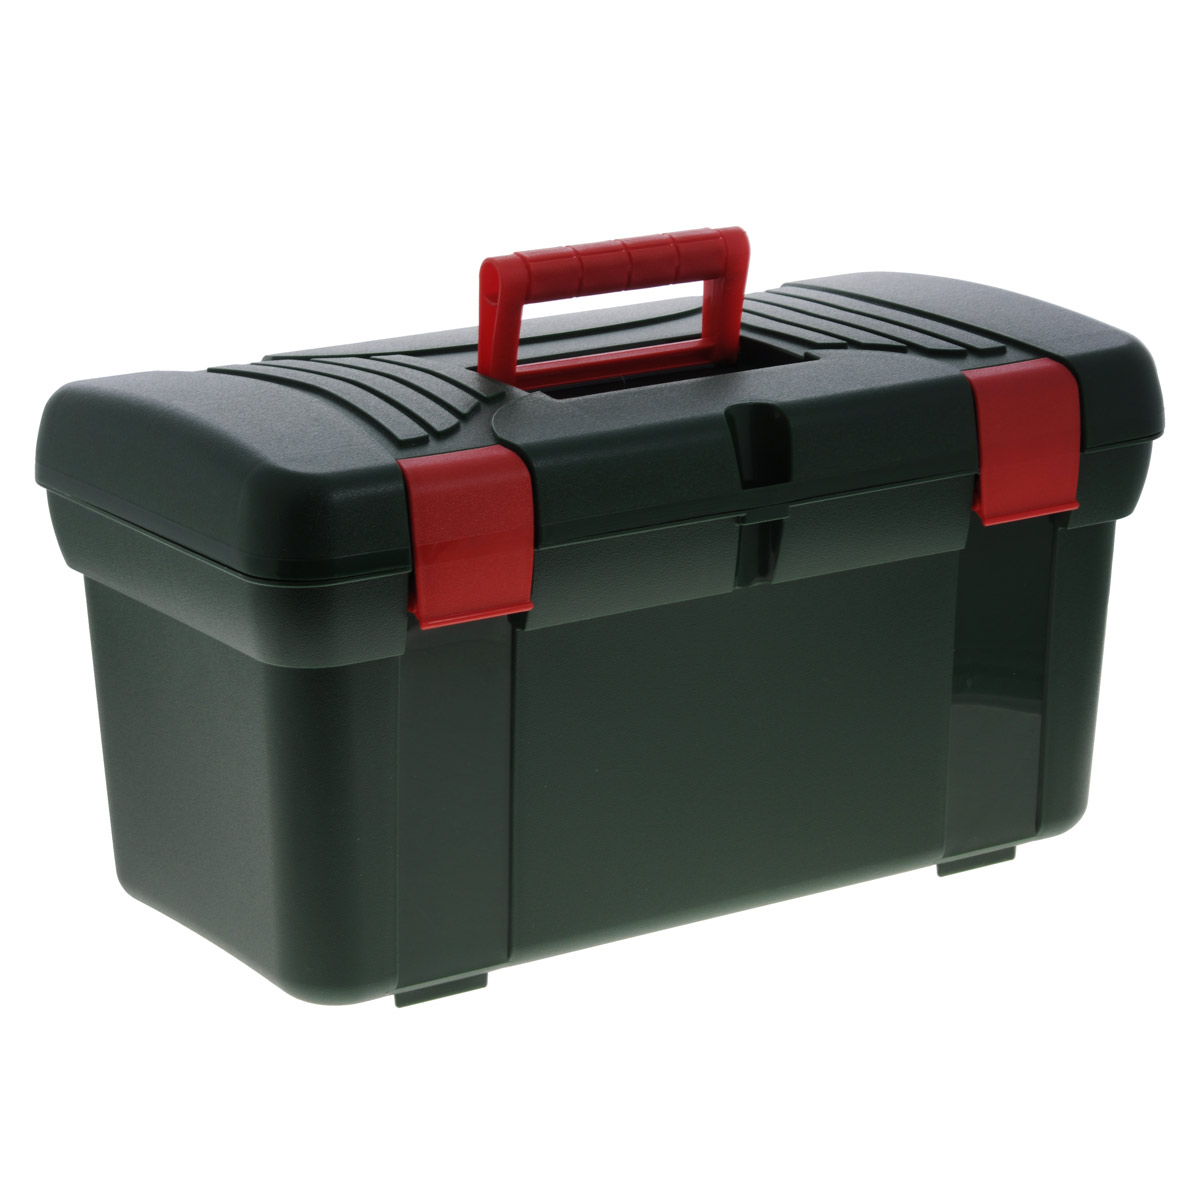 Ящик Универсал, 50 х 26 х 27 см ящик балконный santino 60 х 19 х 15 см